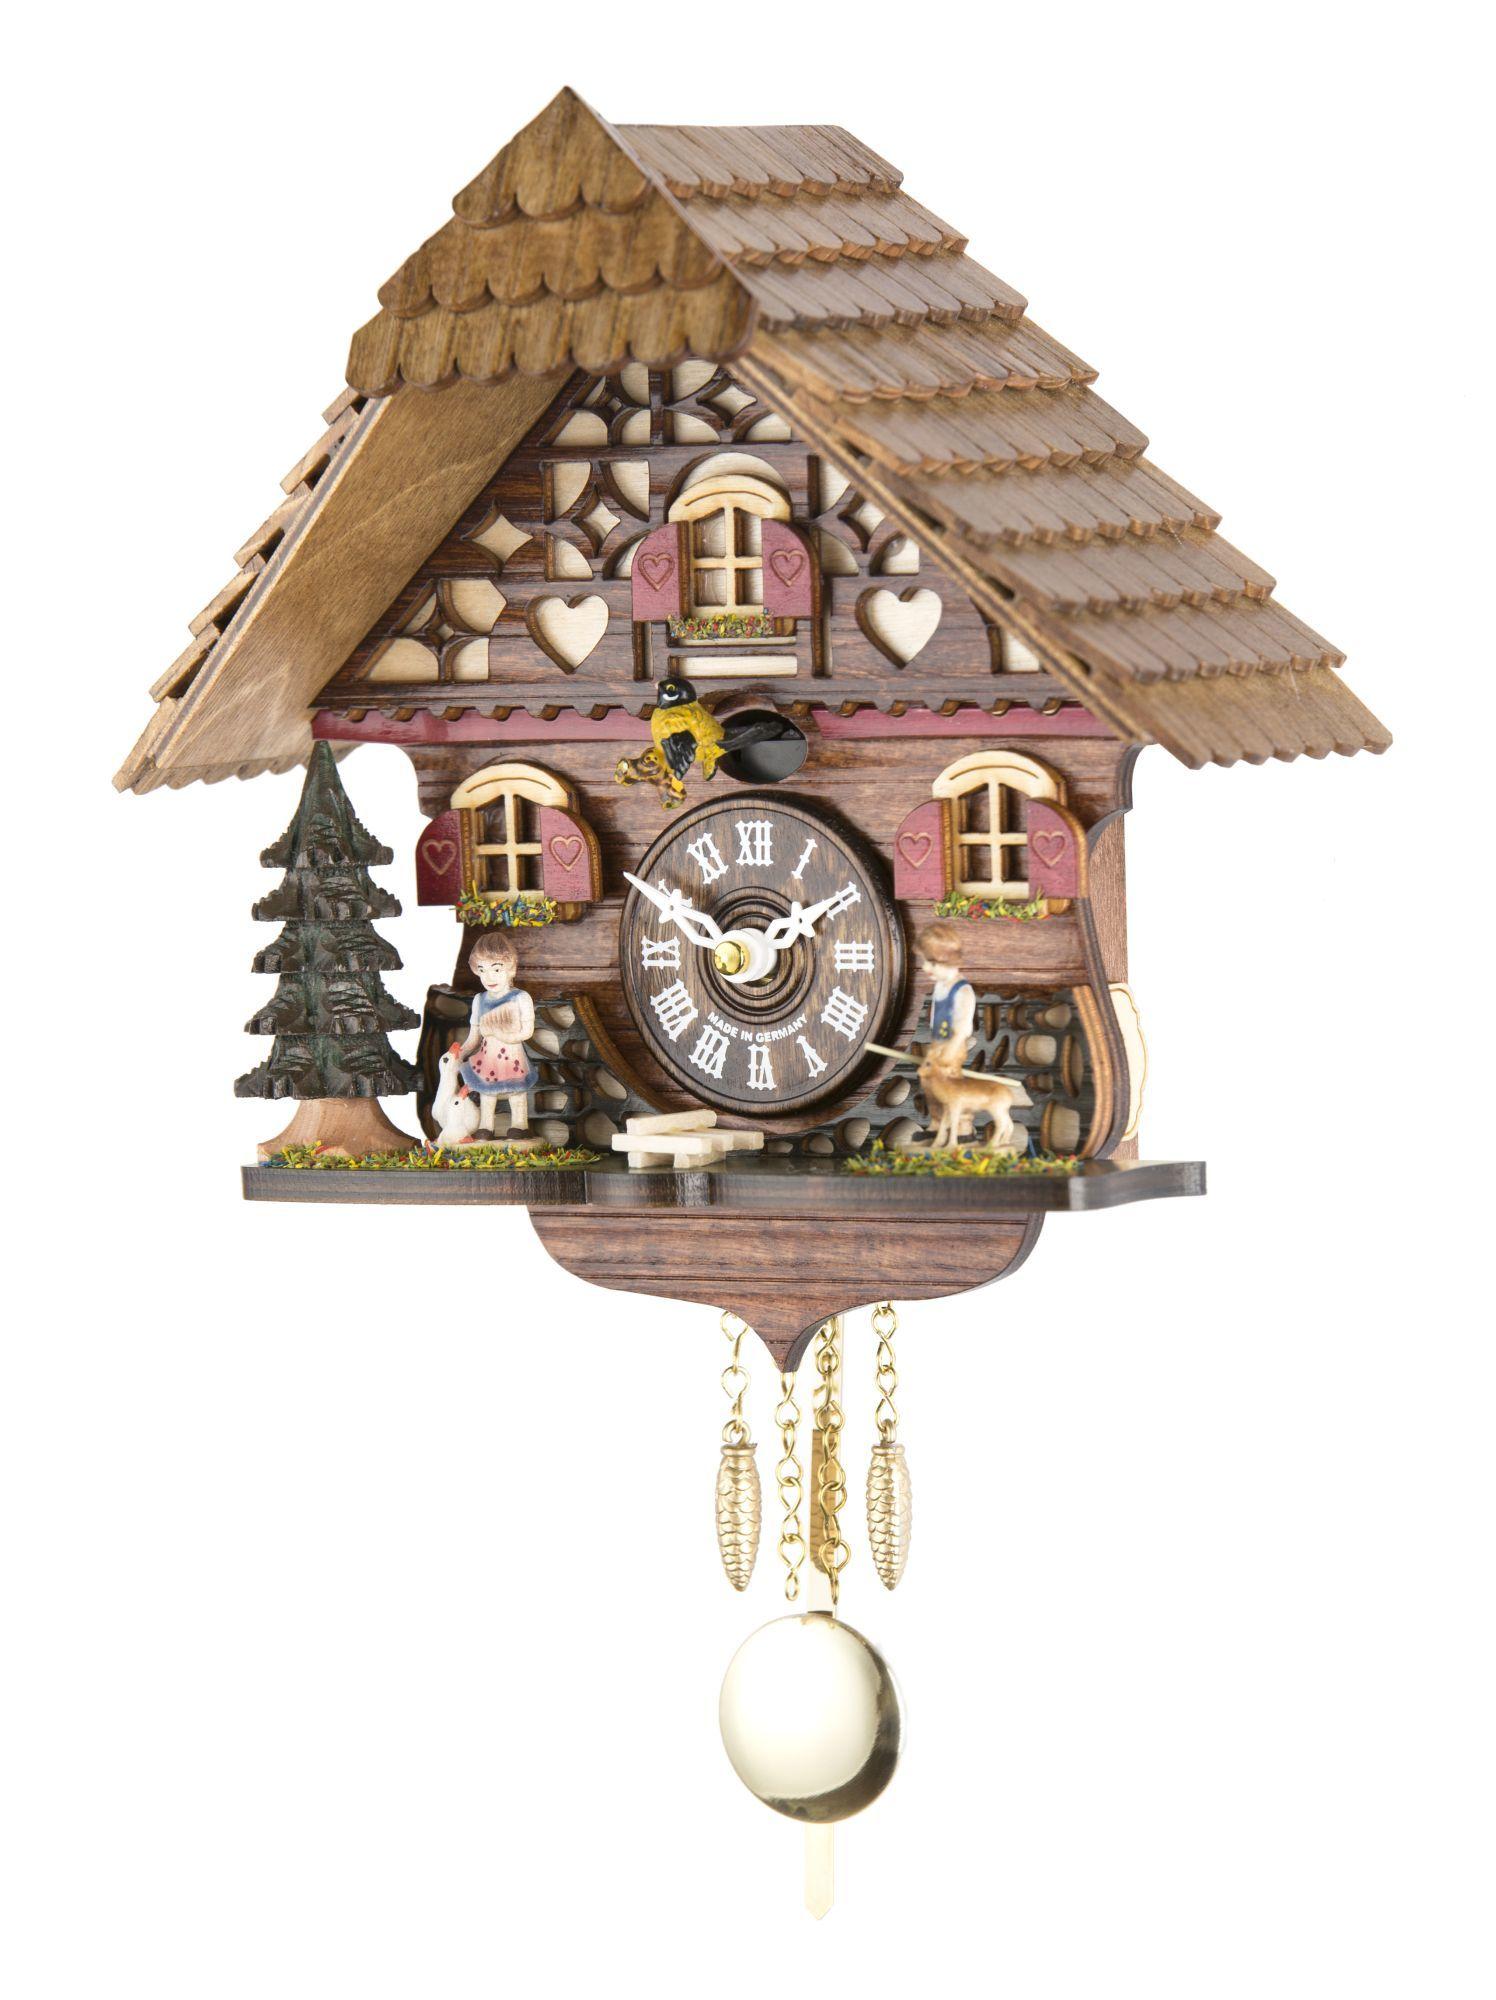 Часы настенные Часы настенные с кукушкой Tomas Stern 5027 chasy-nastennye-s-kukushkoy-tomas-stern-5027-germaniya.jpg